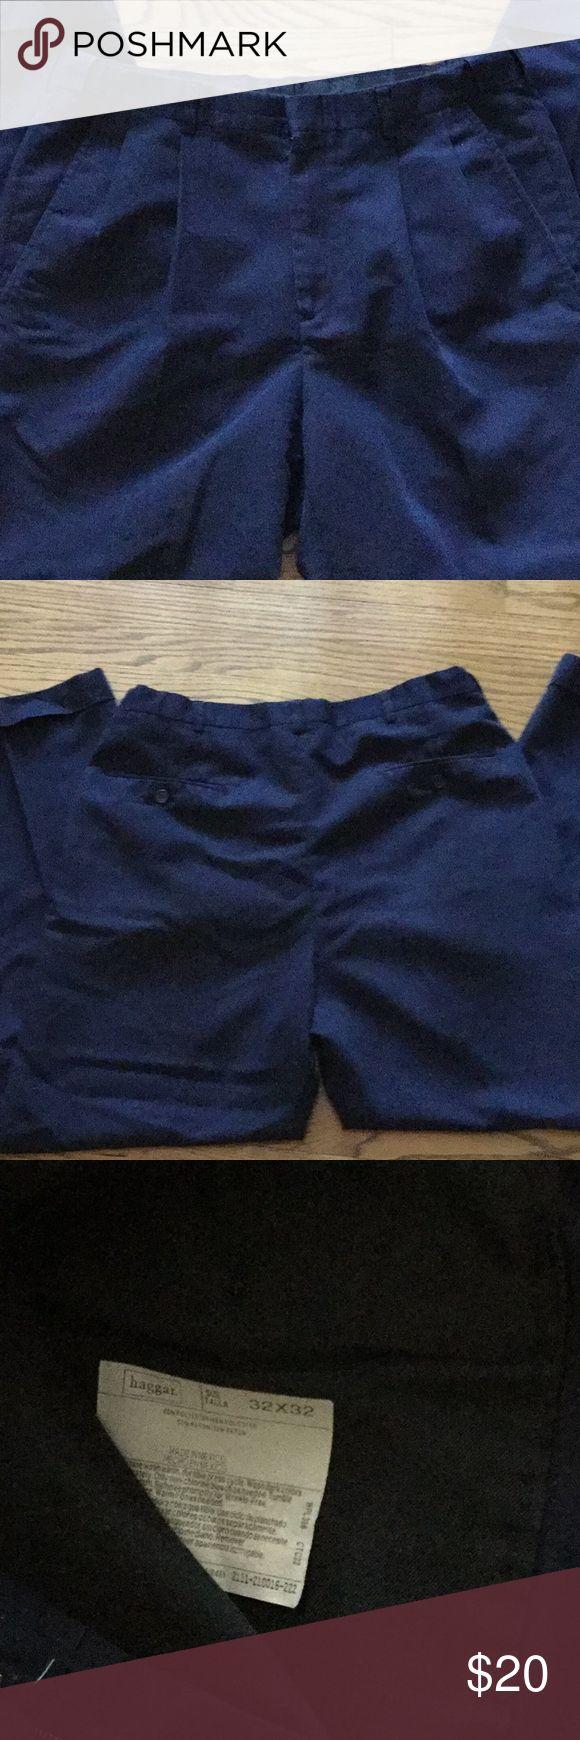 "Men's Haggar Black Label Navy Blue Dress Pant 32 Inside has hidden elastic so it can fit up to 33"" waist, pleated, cuff dress pant Haggar Pants Dress"